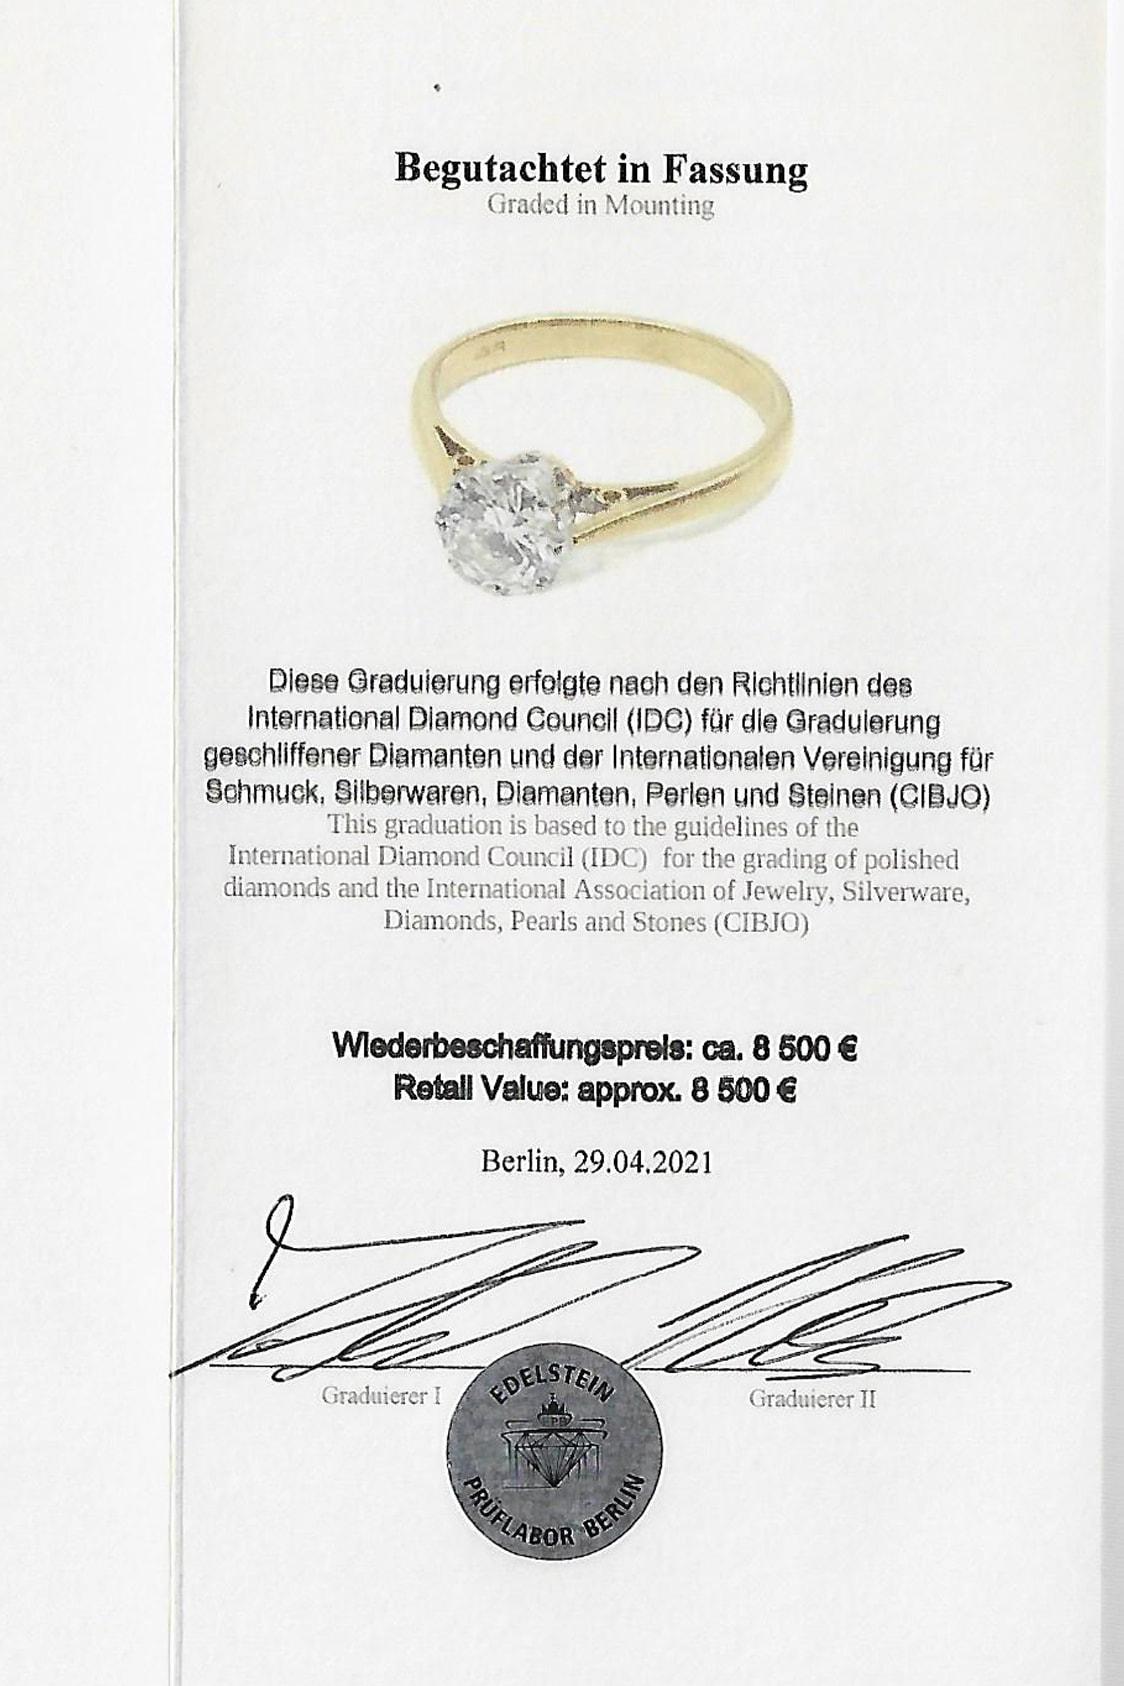 antikschmuck-ring-226c